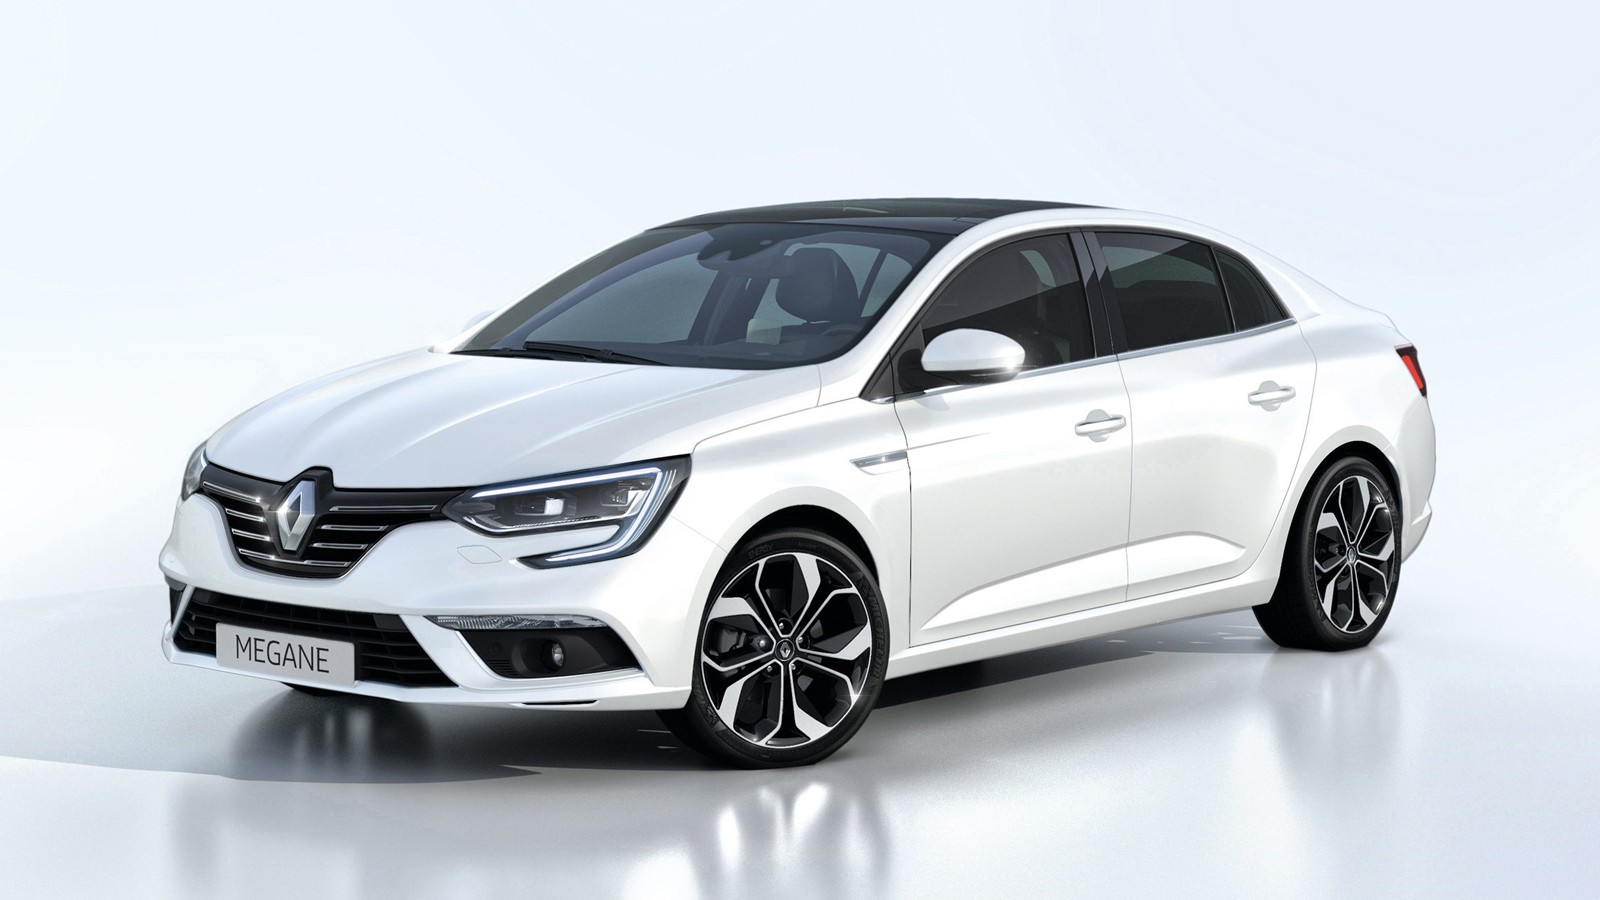 Renault Megane Paris front